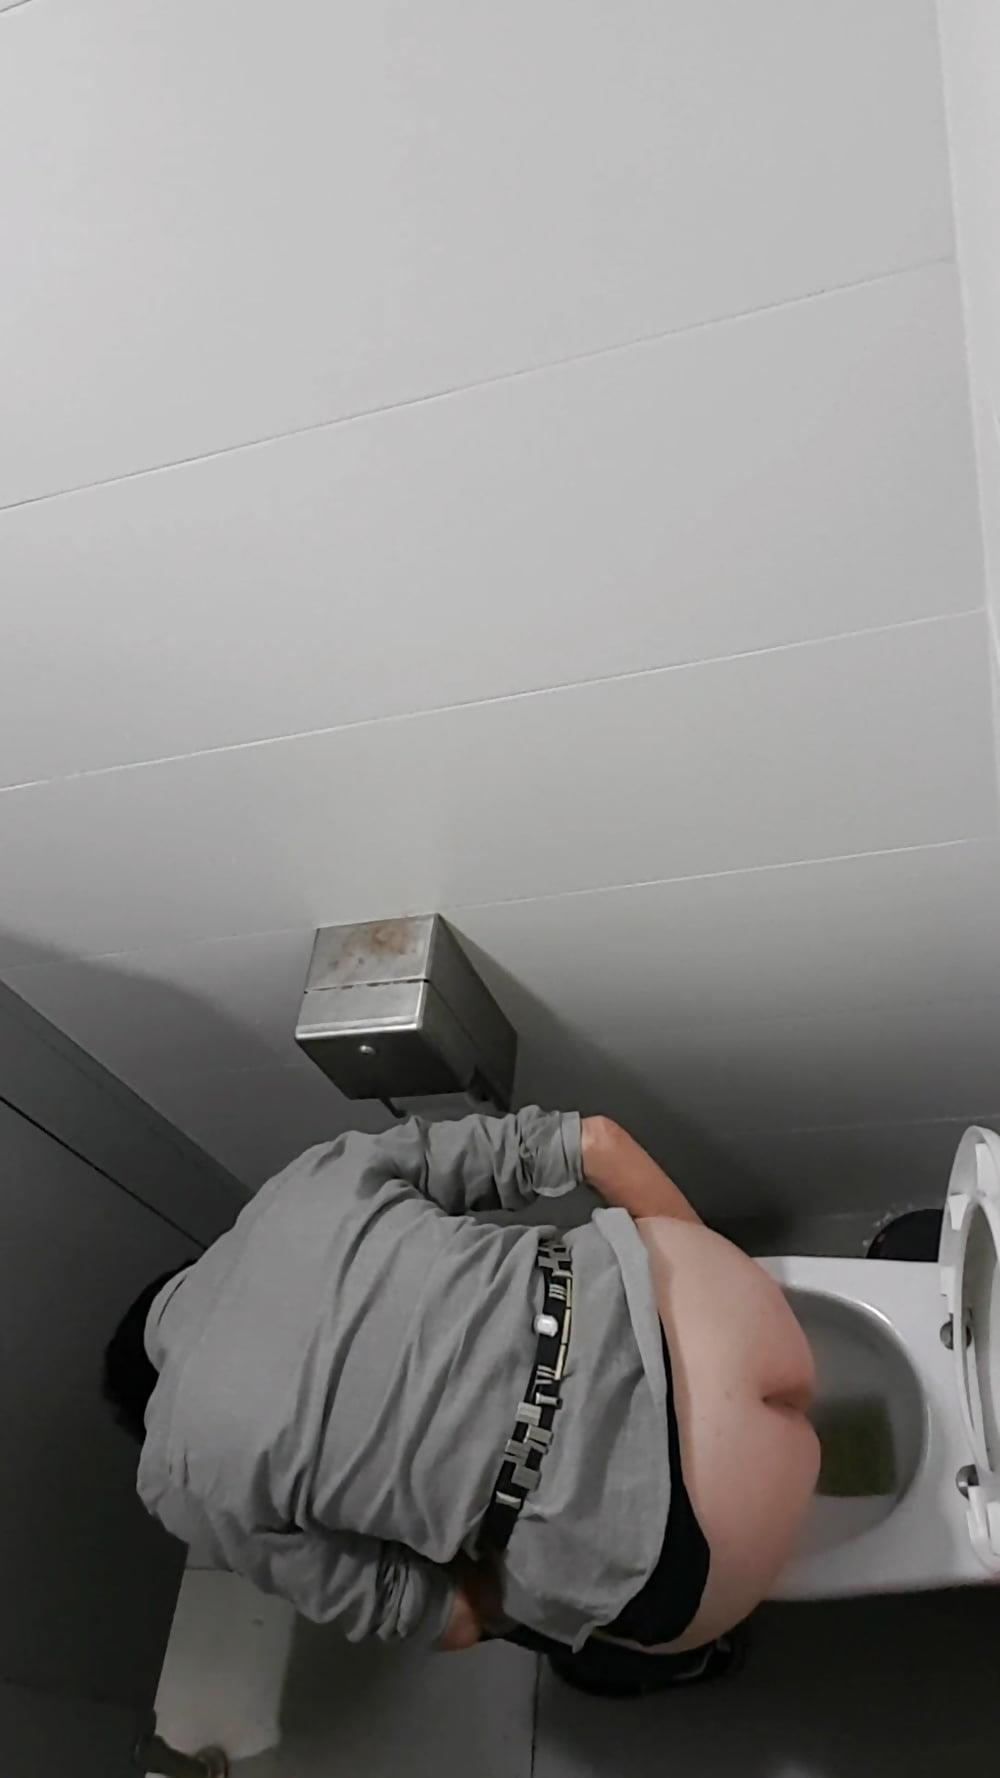 Public toilet spy cam porn-9623